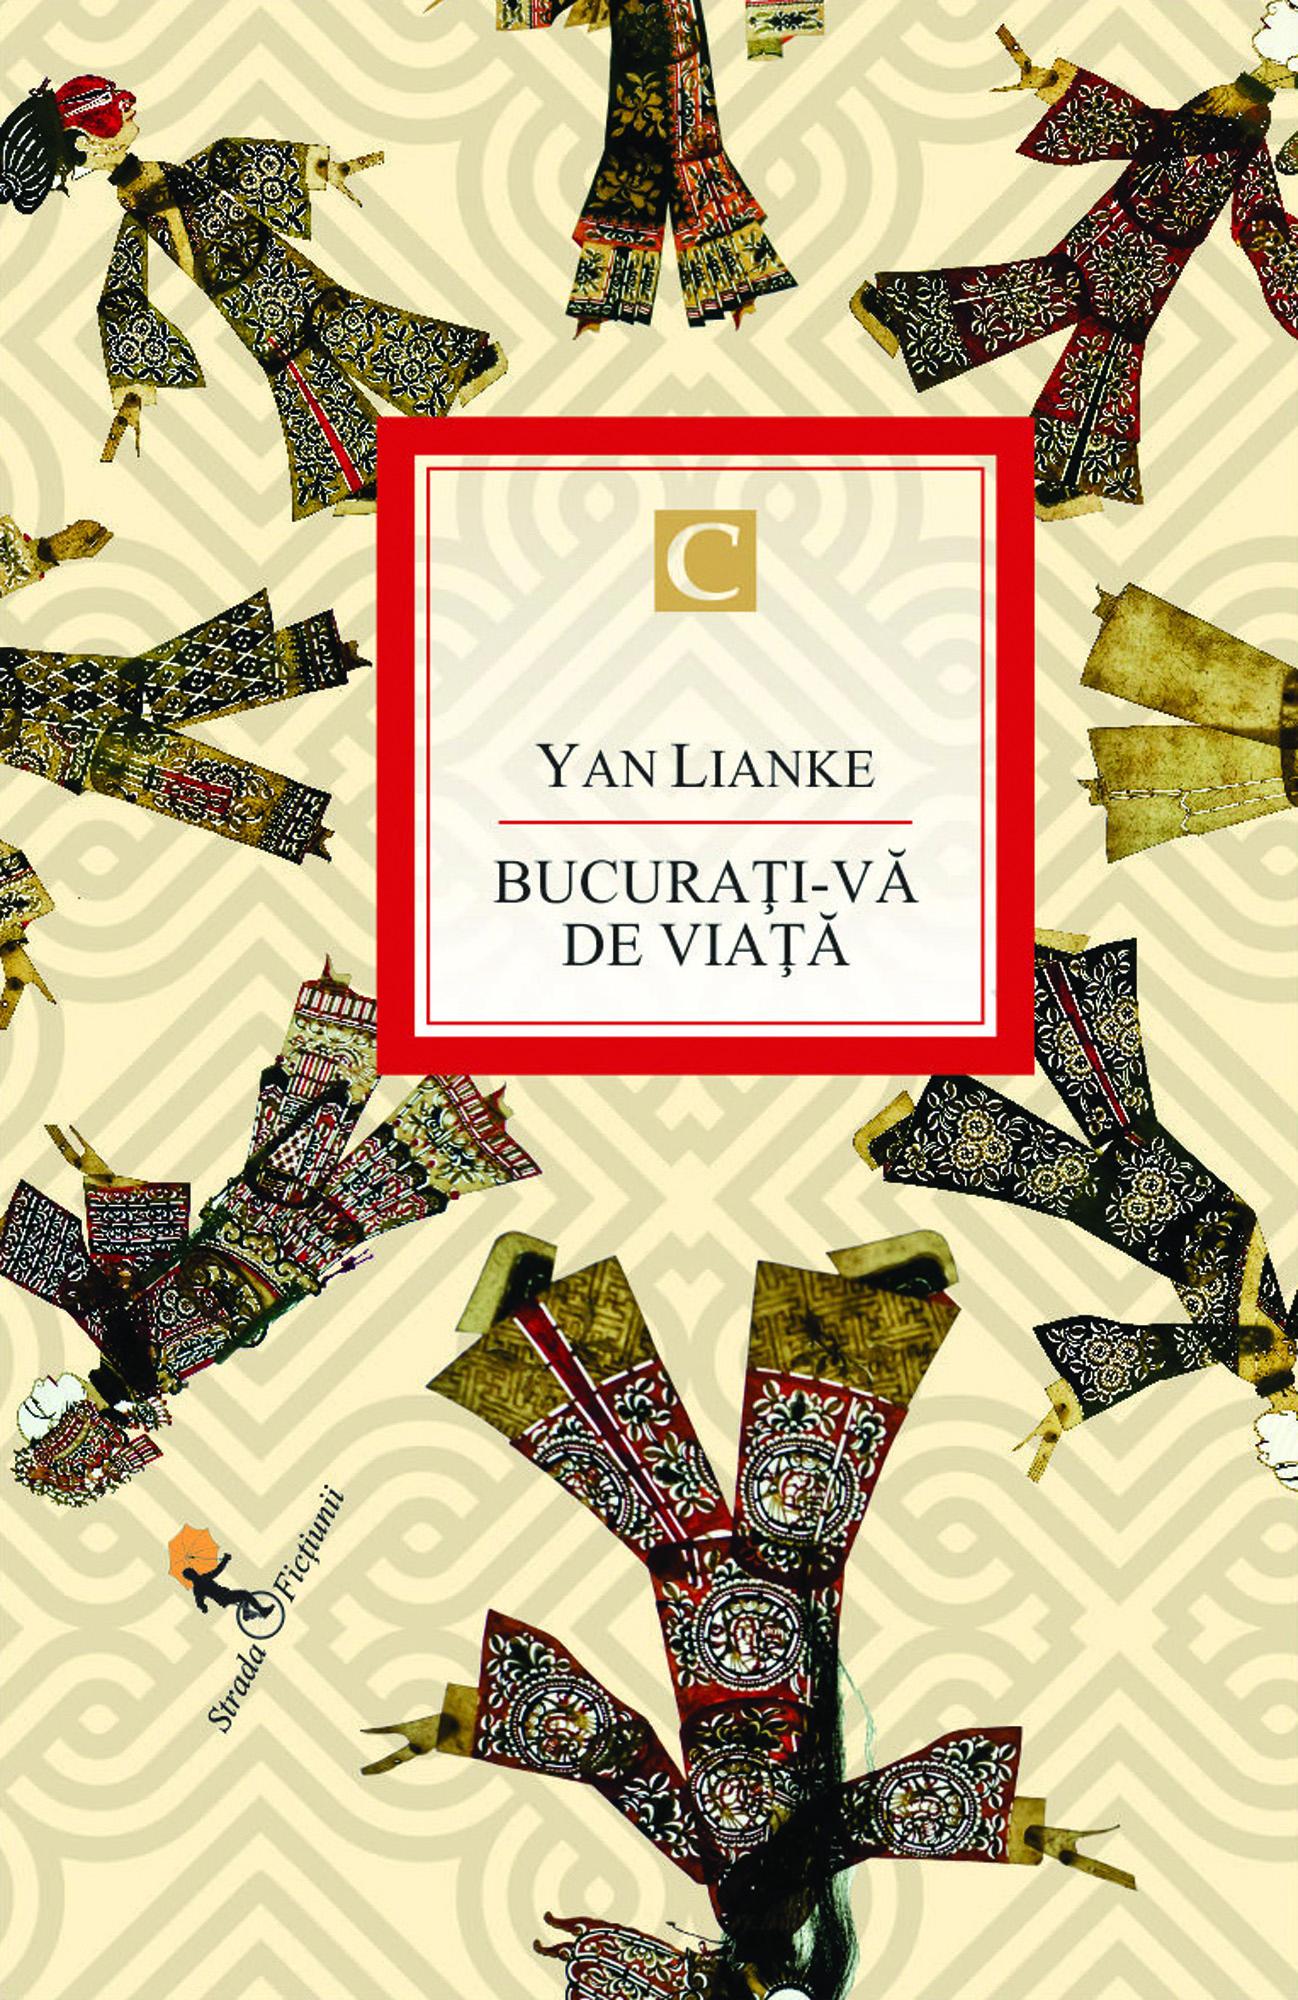 Yan Lianke a câştigat Premiul literar Franz Kafka pentru anul 2014